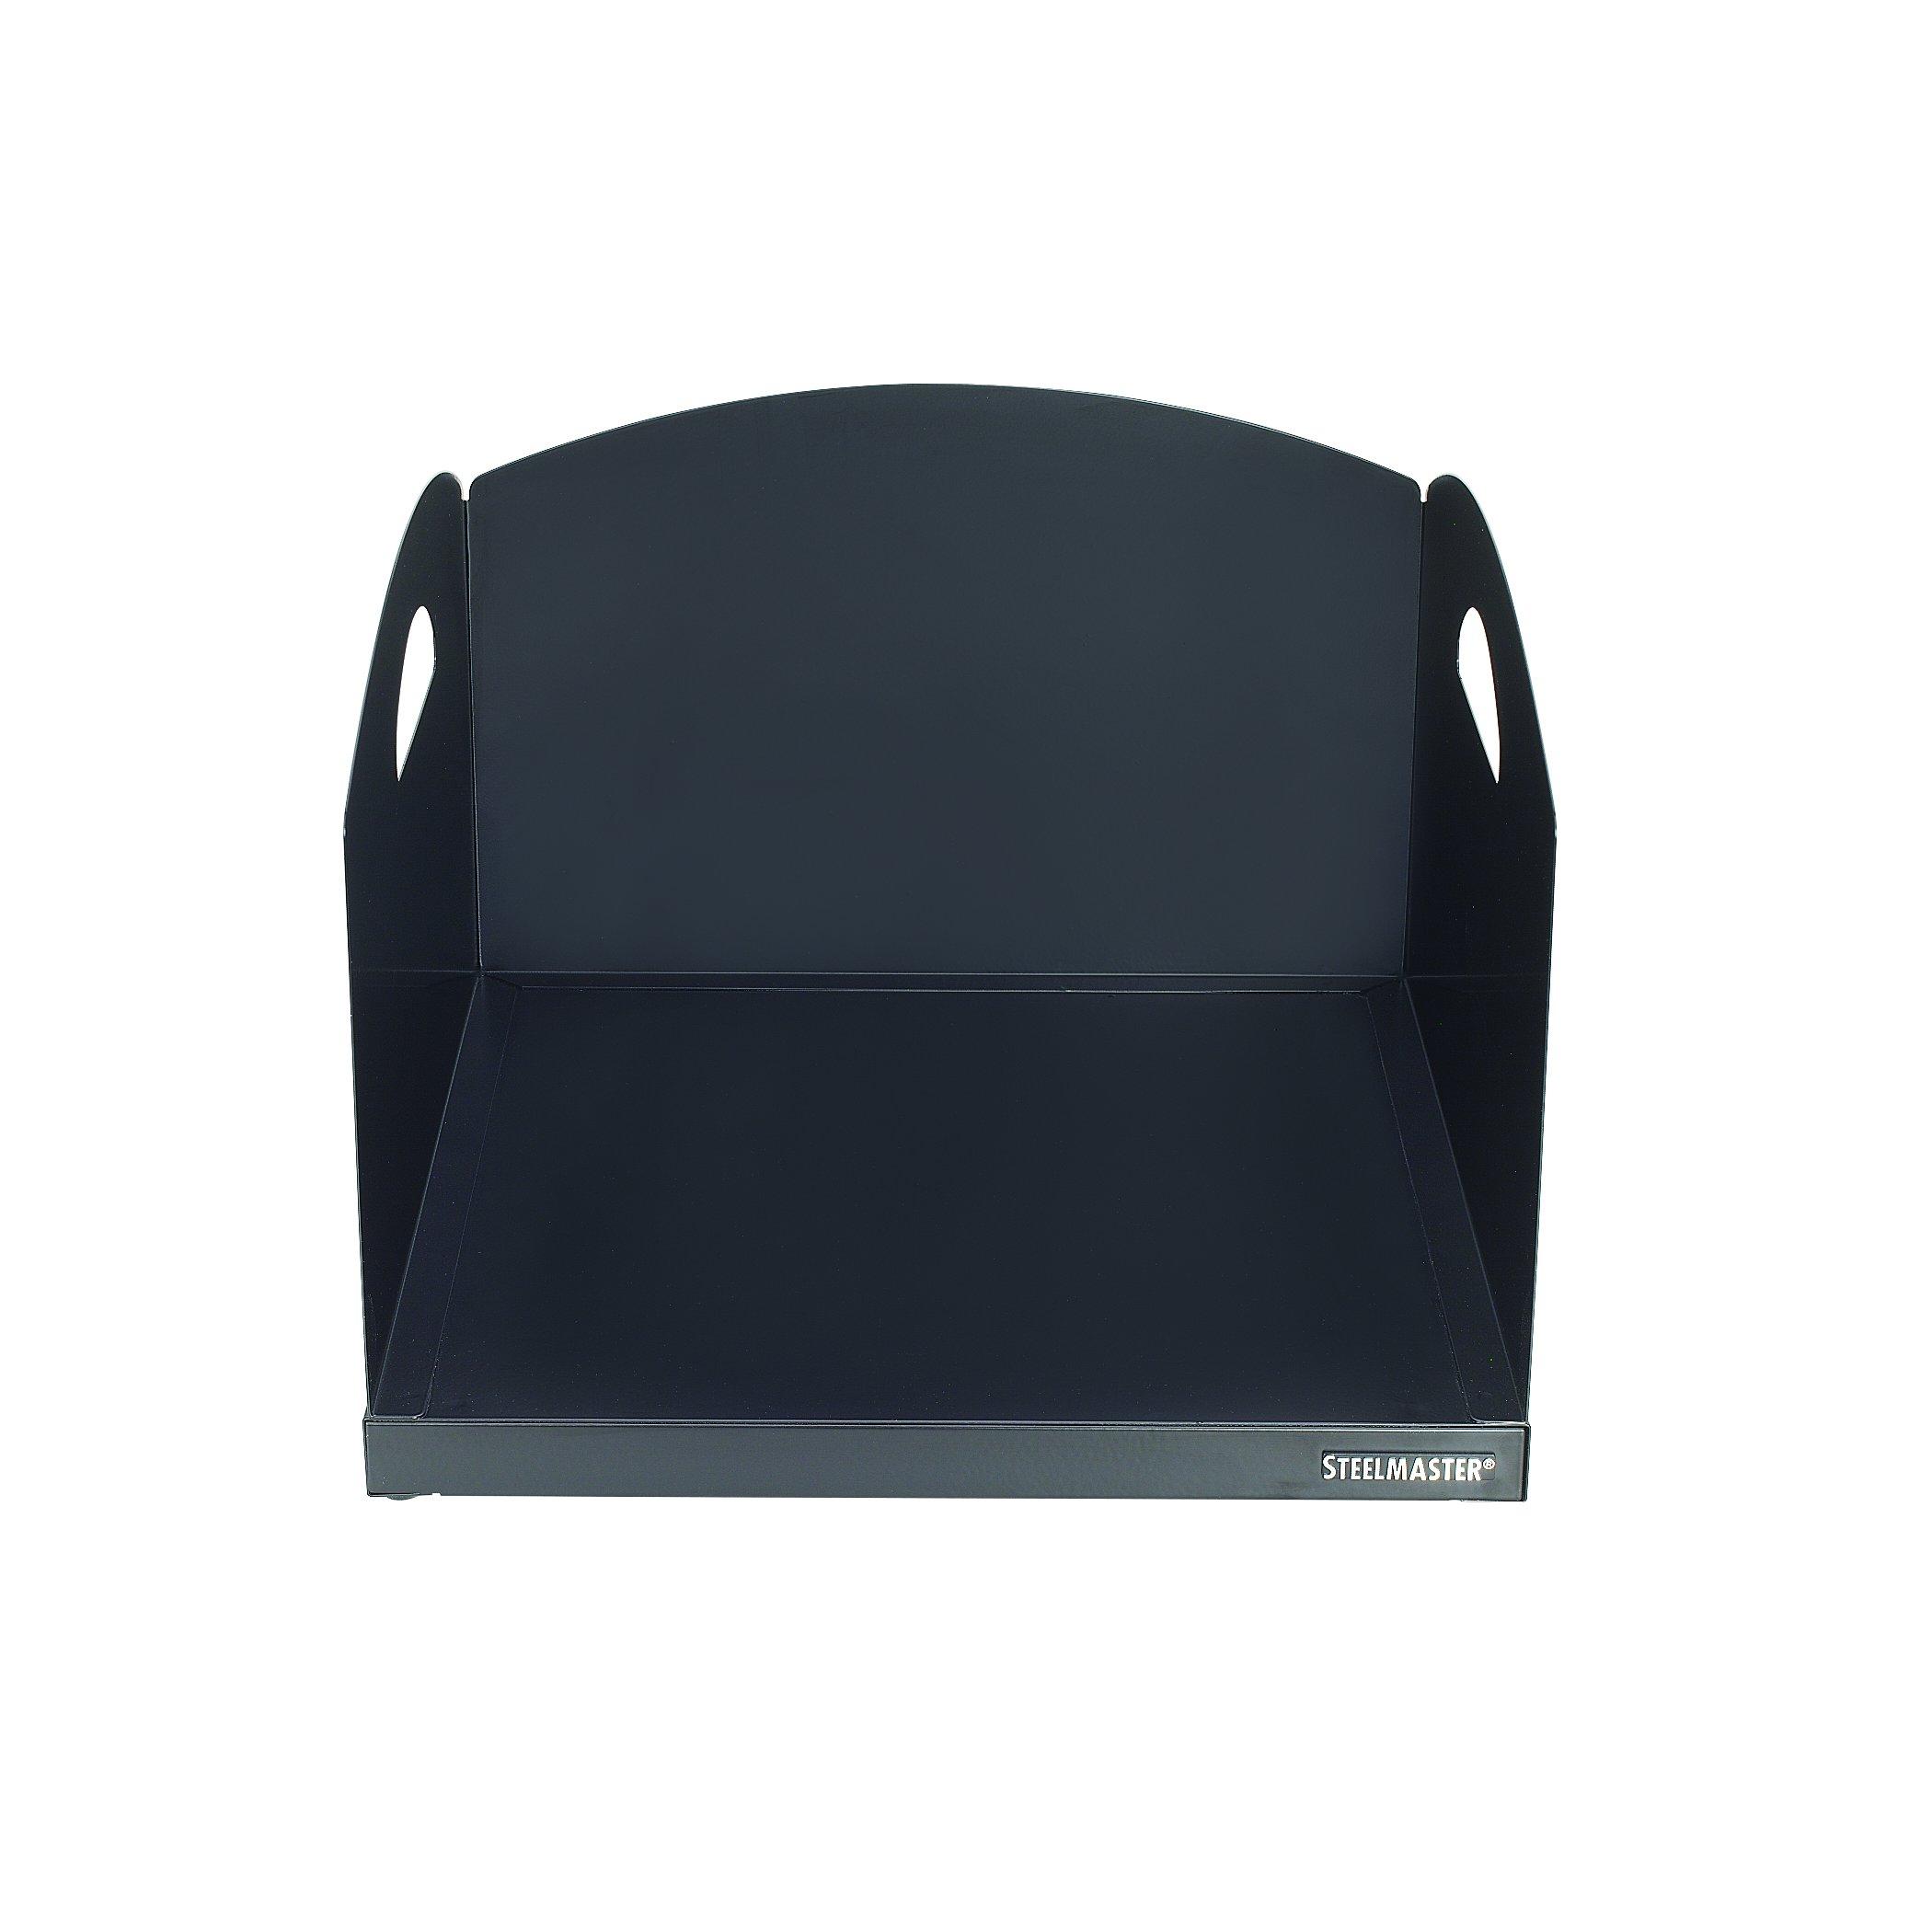 STEELMASTER Big Stacker Extra Deep Inbox, 8.25'' x 12.75'' x 11.125'', Black (264001H04)